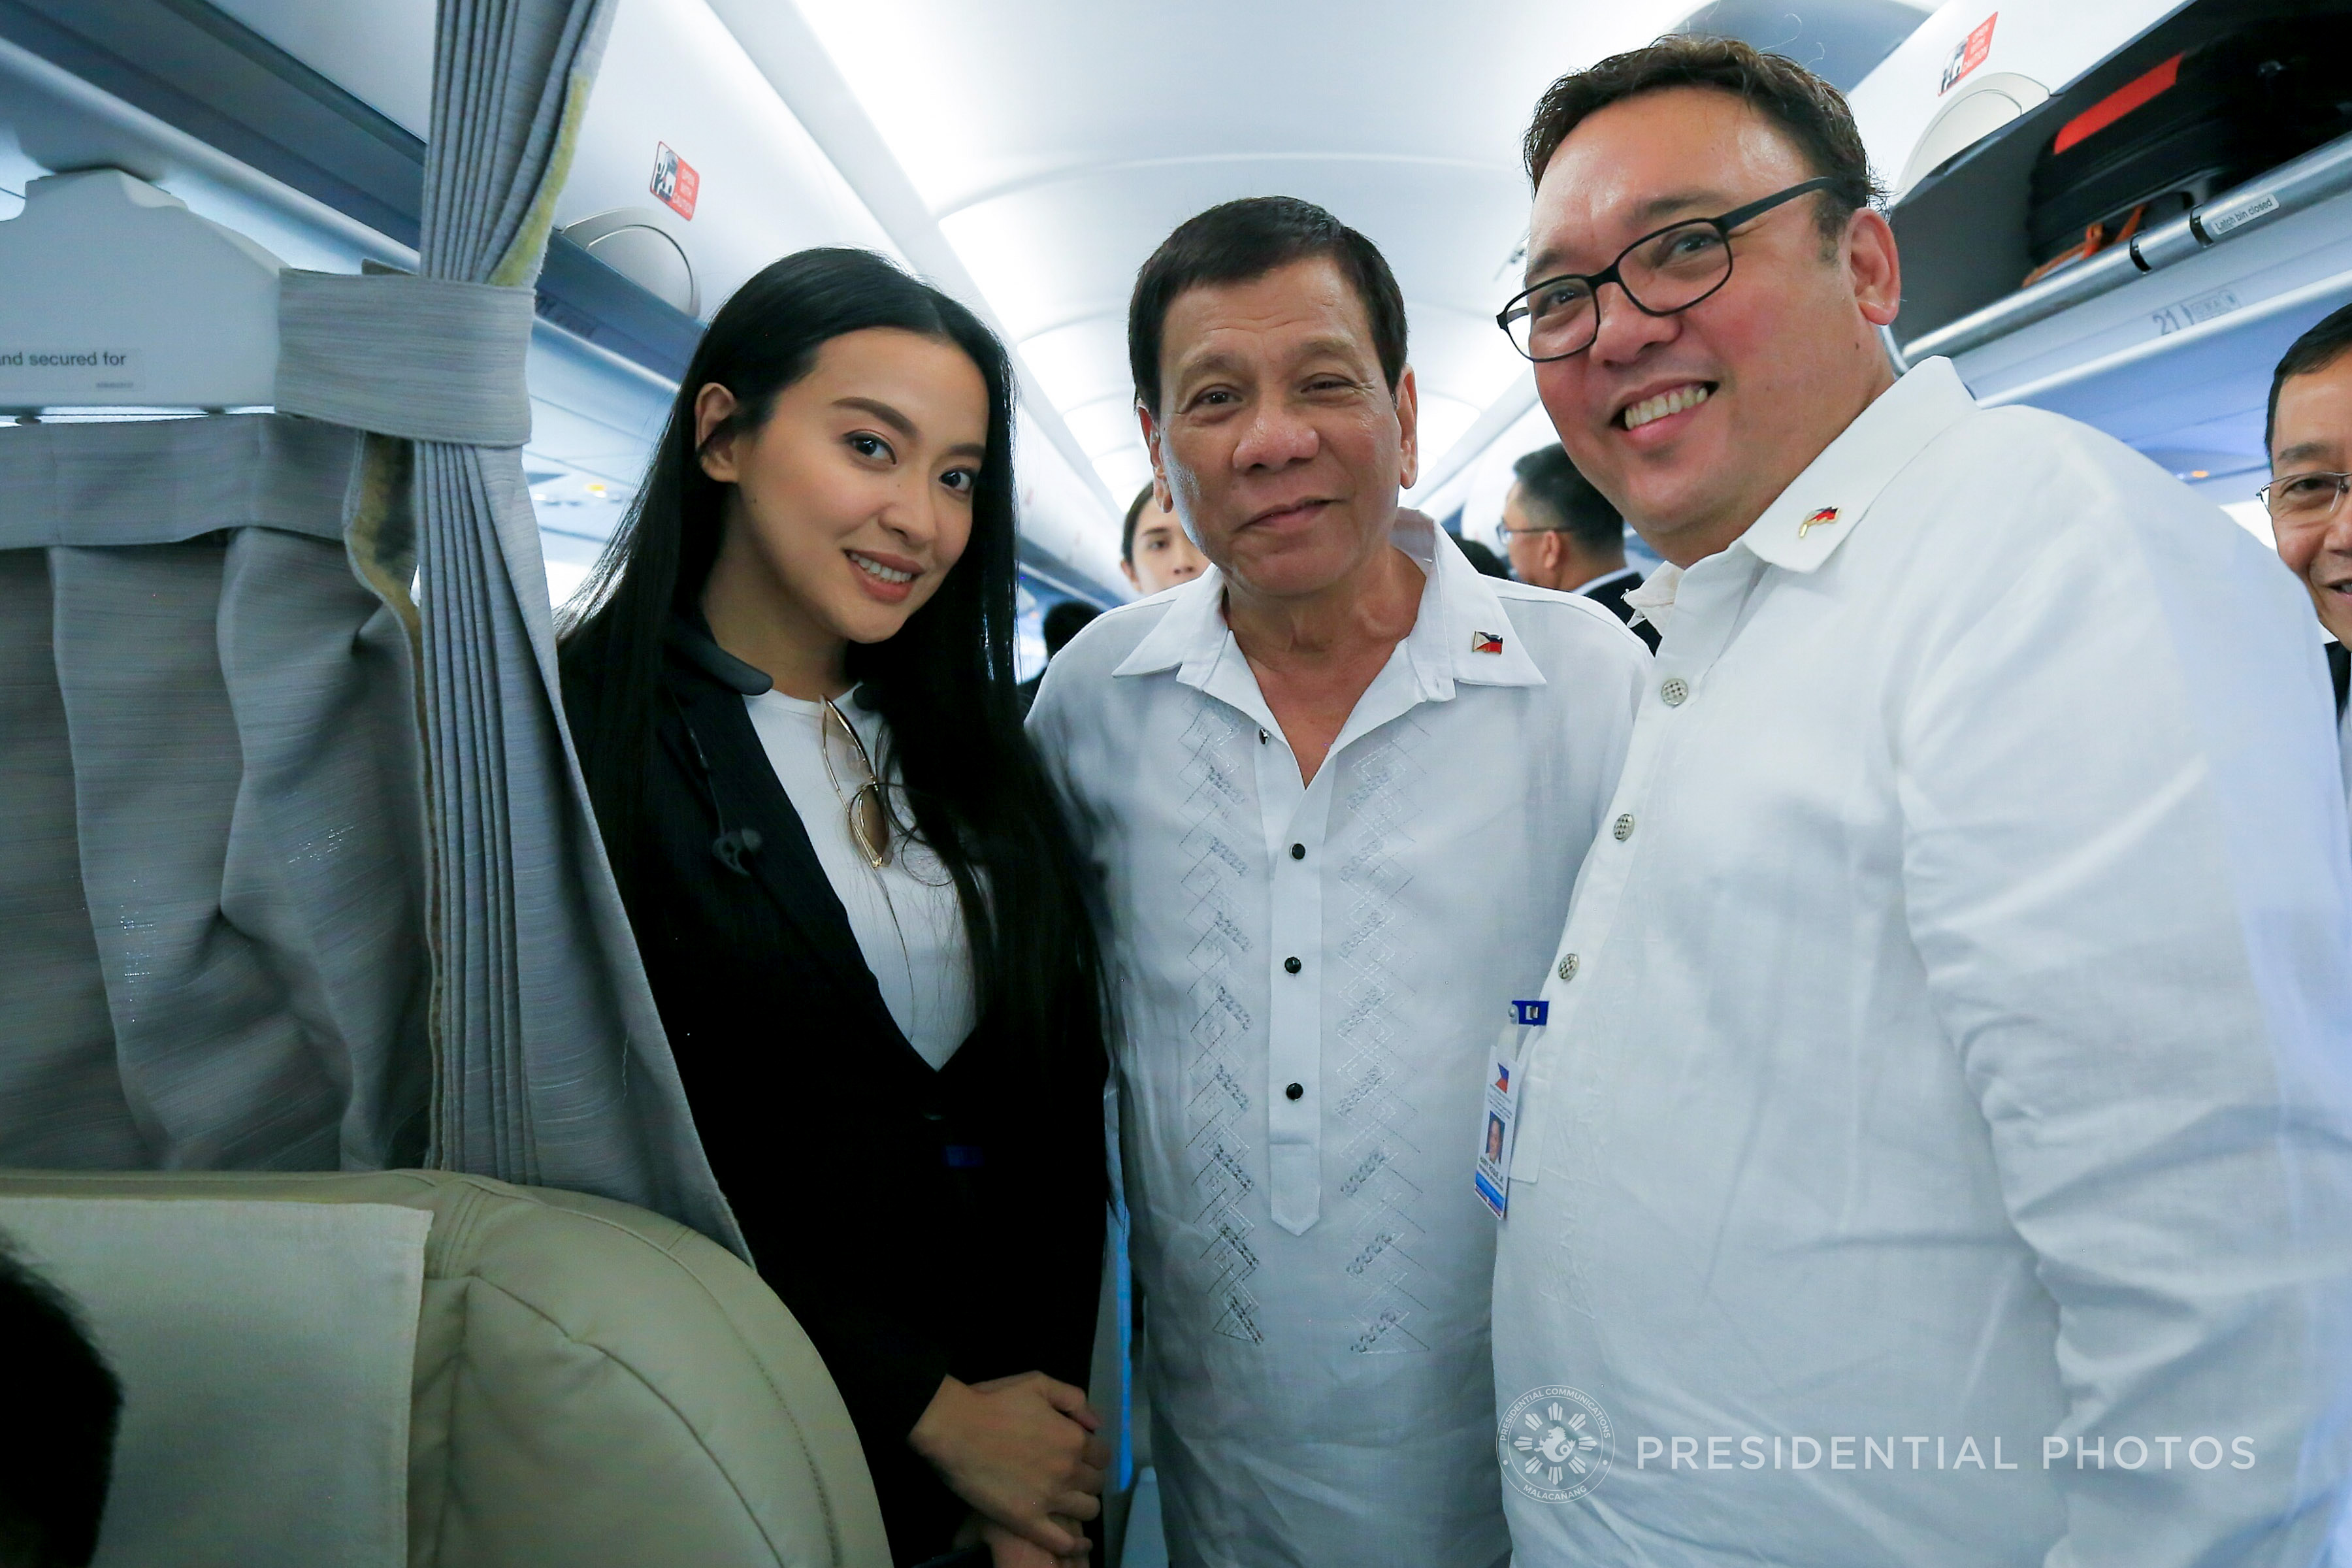 COMMUNICATING DUTERTE. Secretary Harry Roque poses with President Duterte and Assistant Secretary Mocha Uson. Malacau00f1ang photo